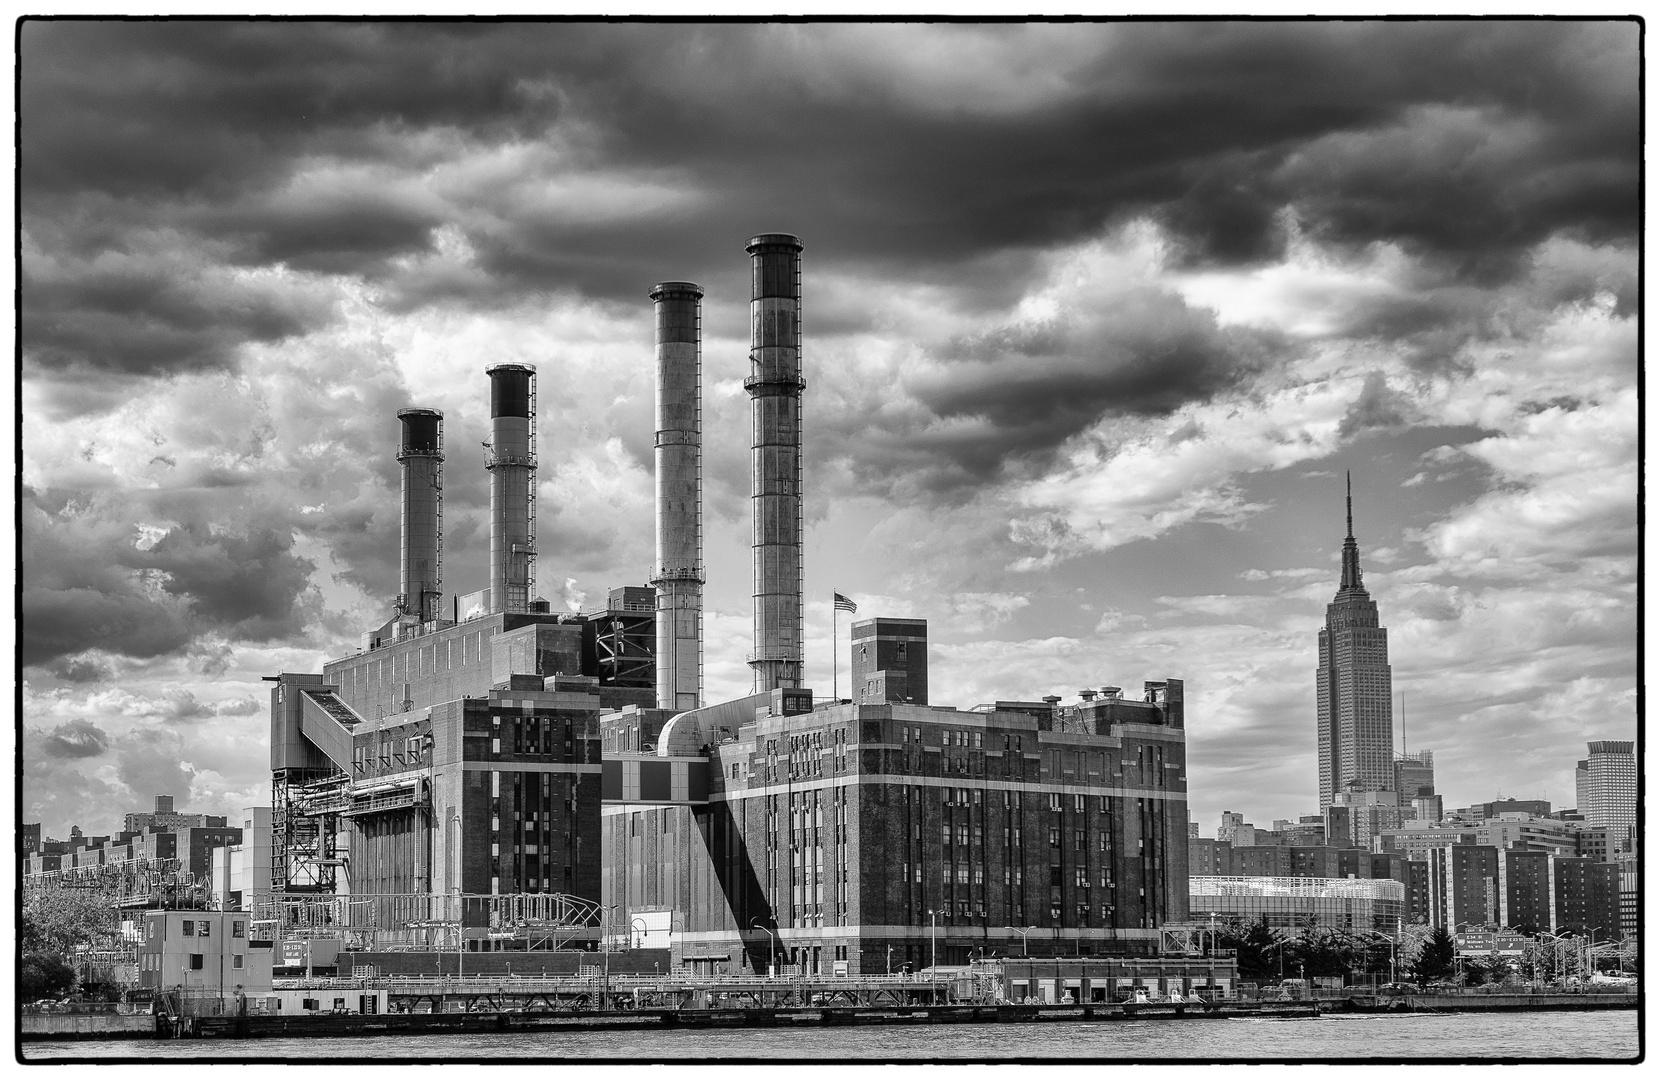 Manhattan - Con Edison Powerplant